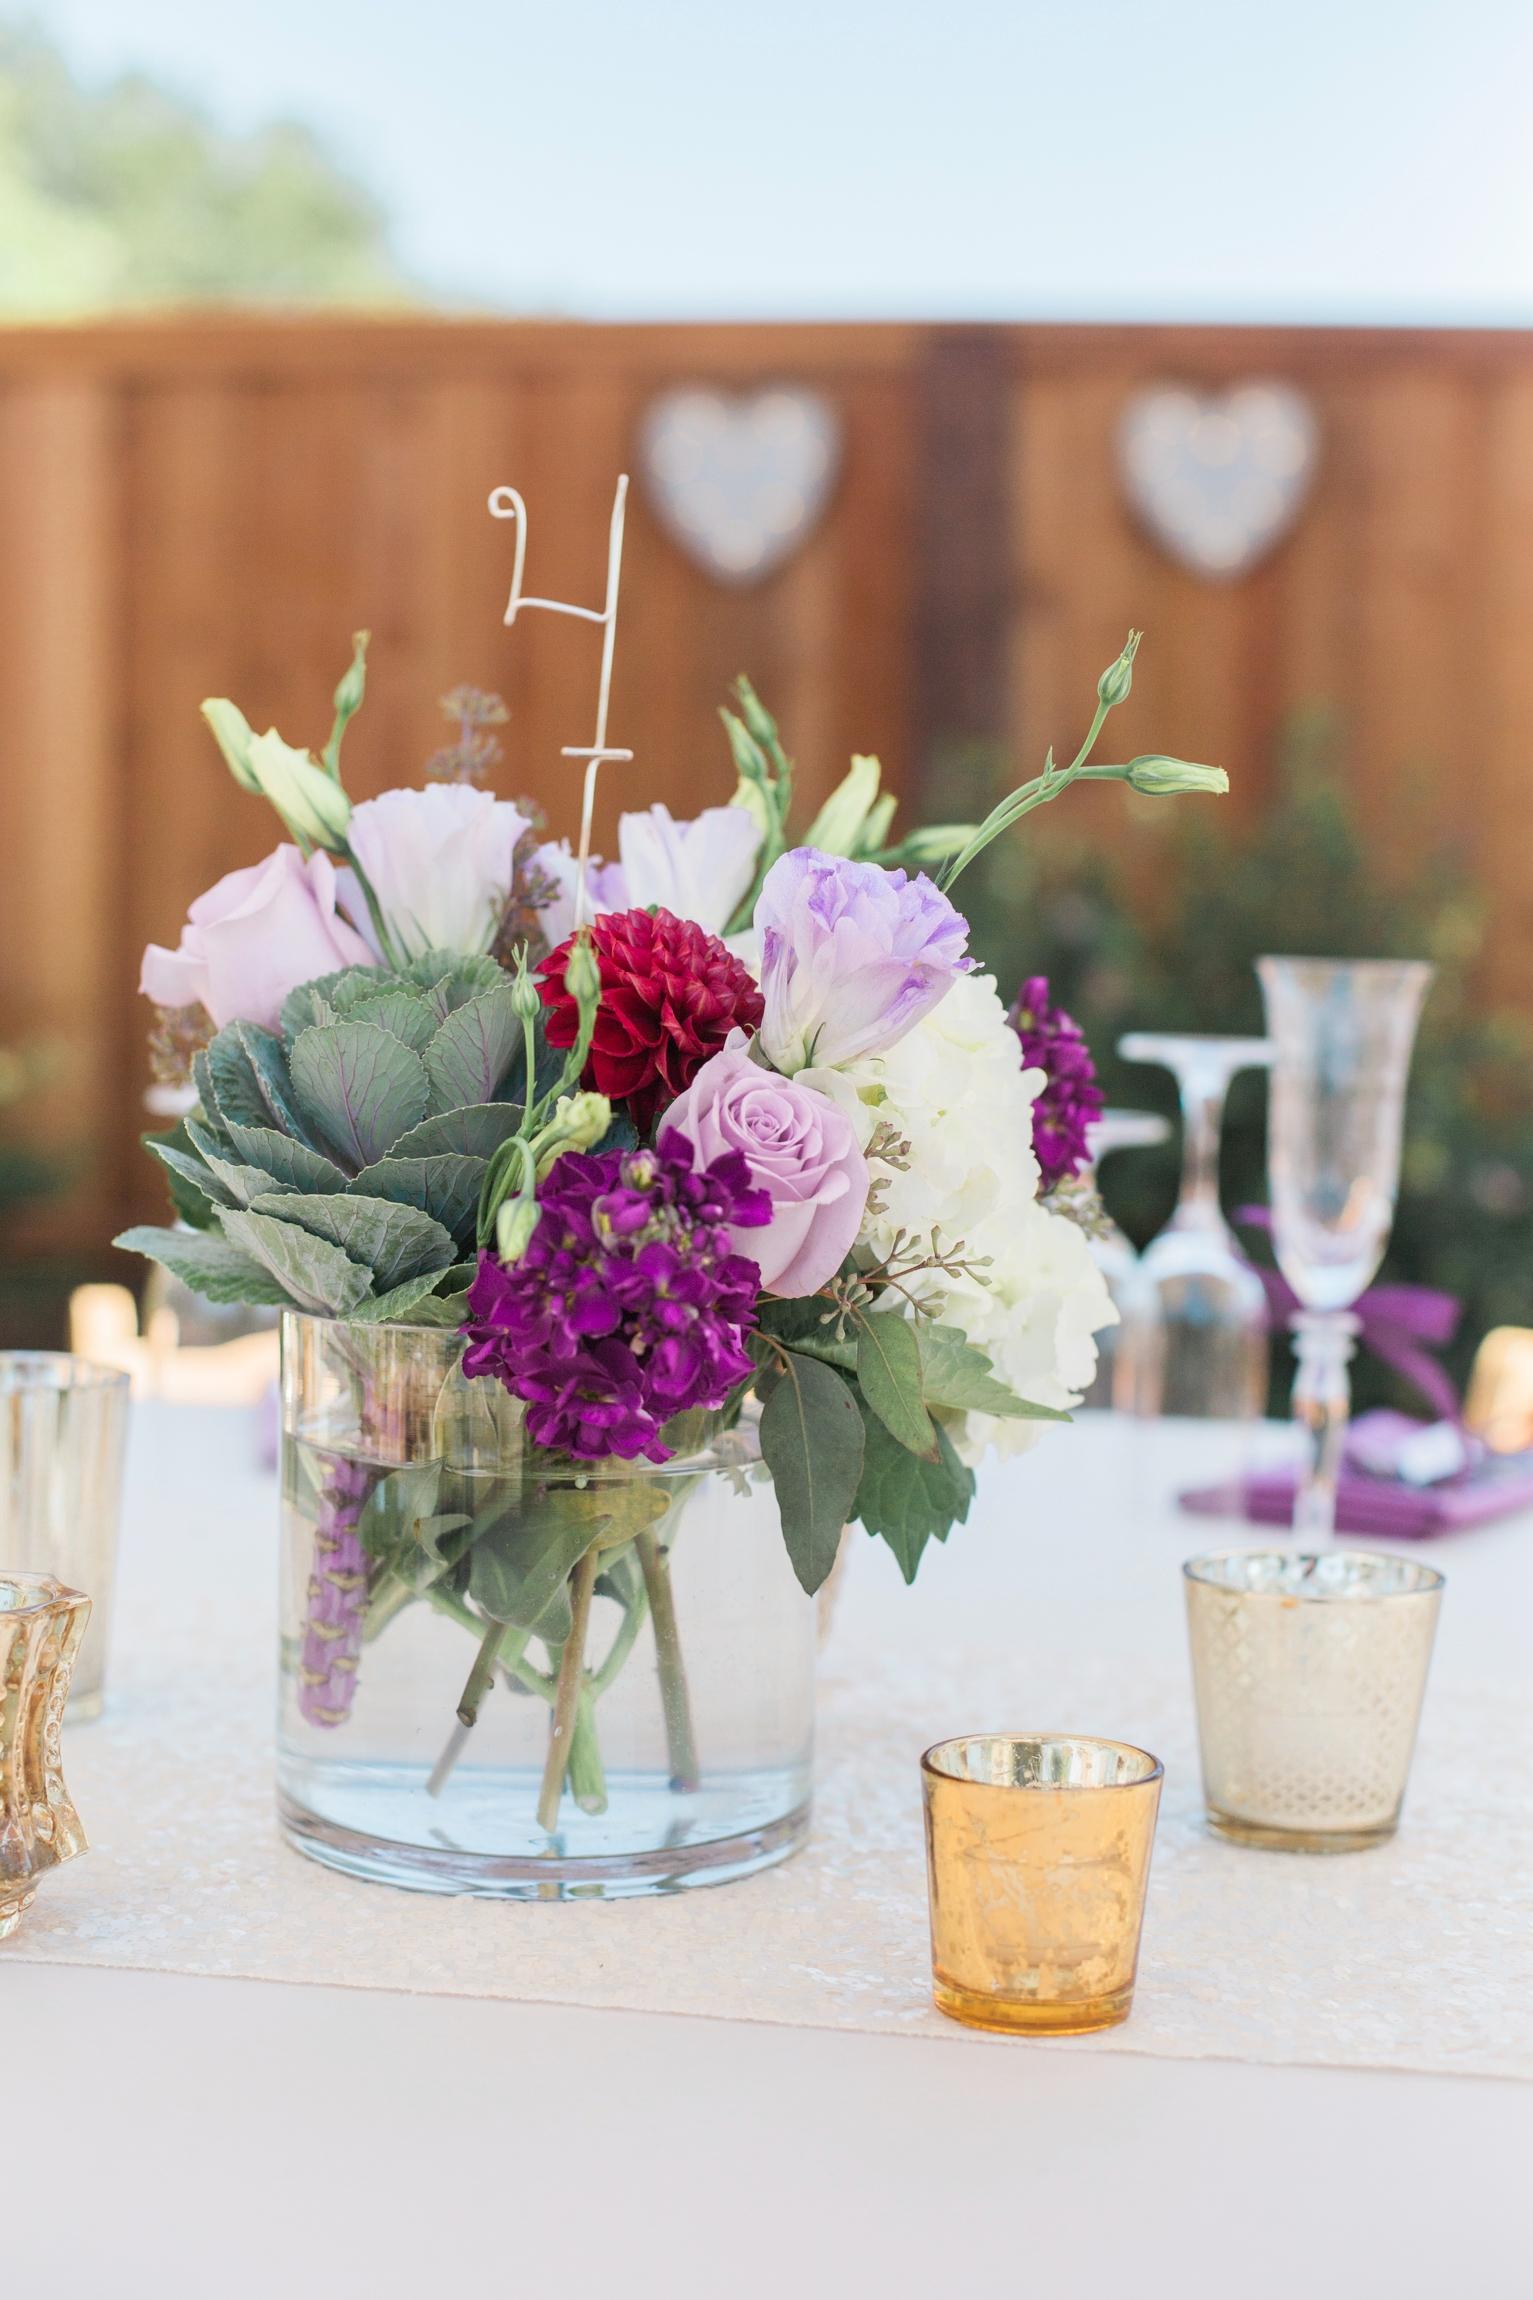 dallas-haley-napa-wedding-photographer-42.jpg